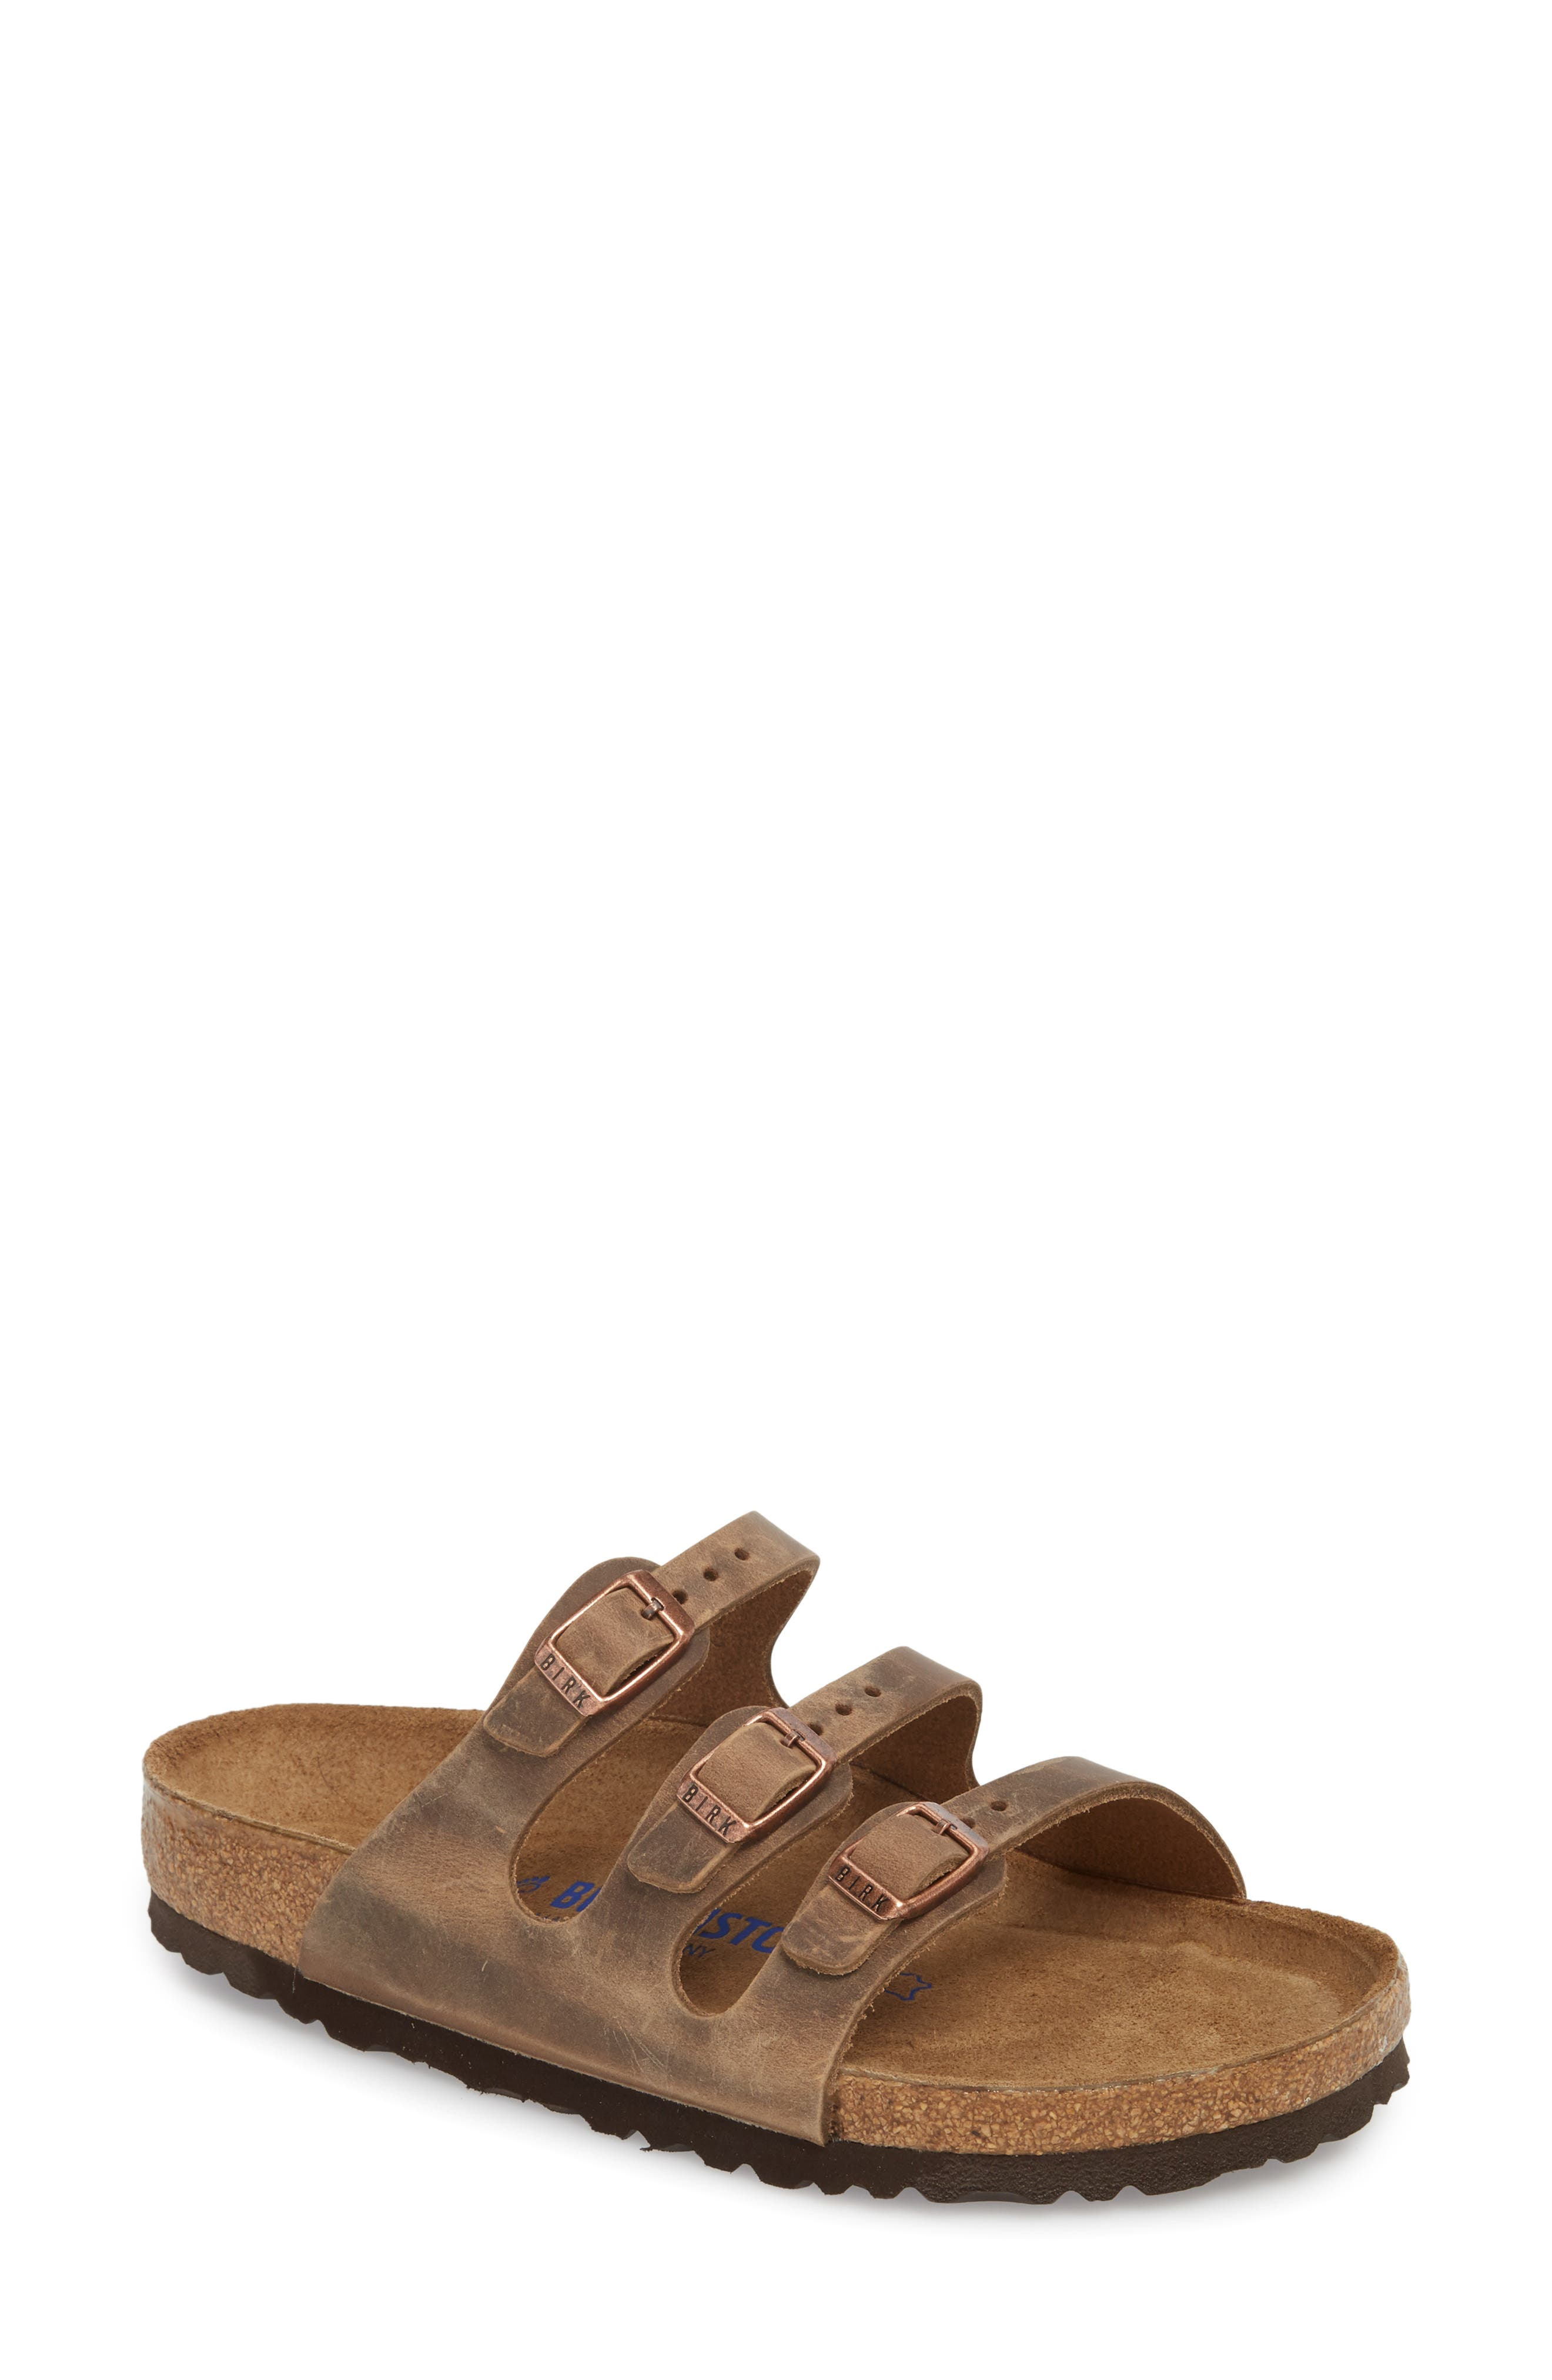 Florida Sandal,                         Main,                         color, Tobacco Oiled Leather